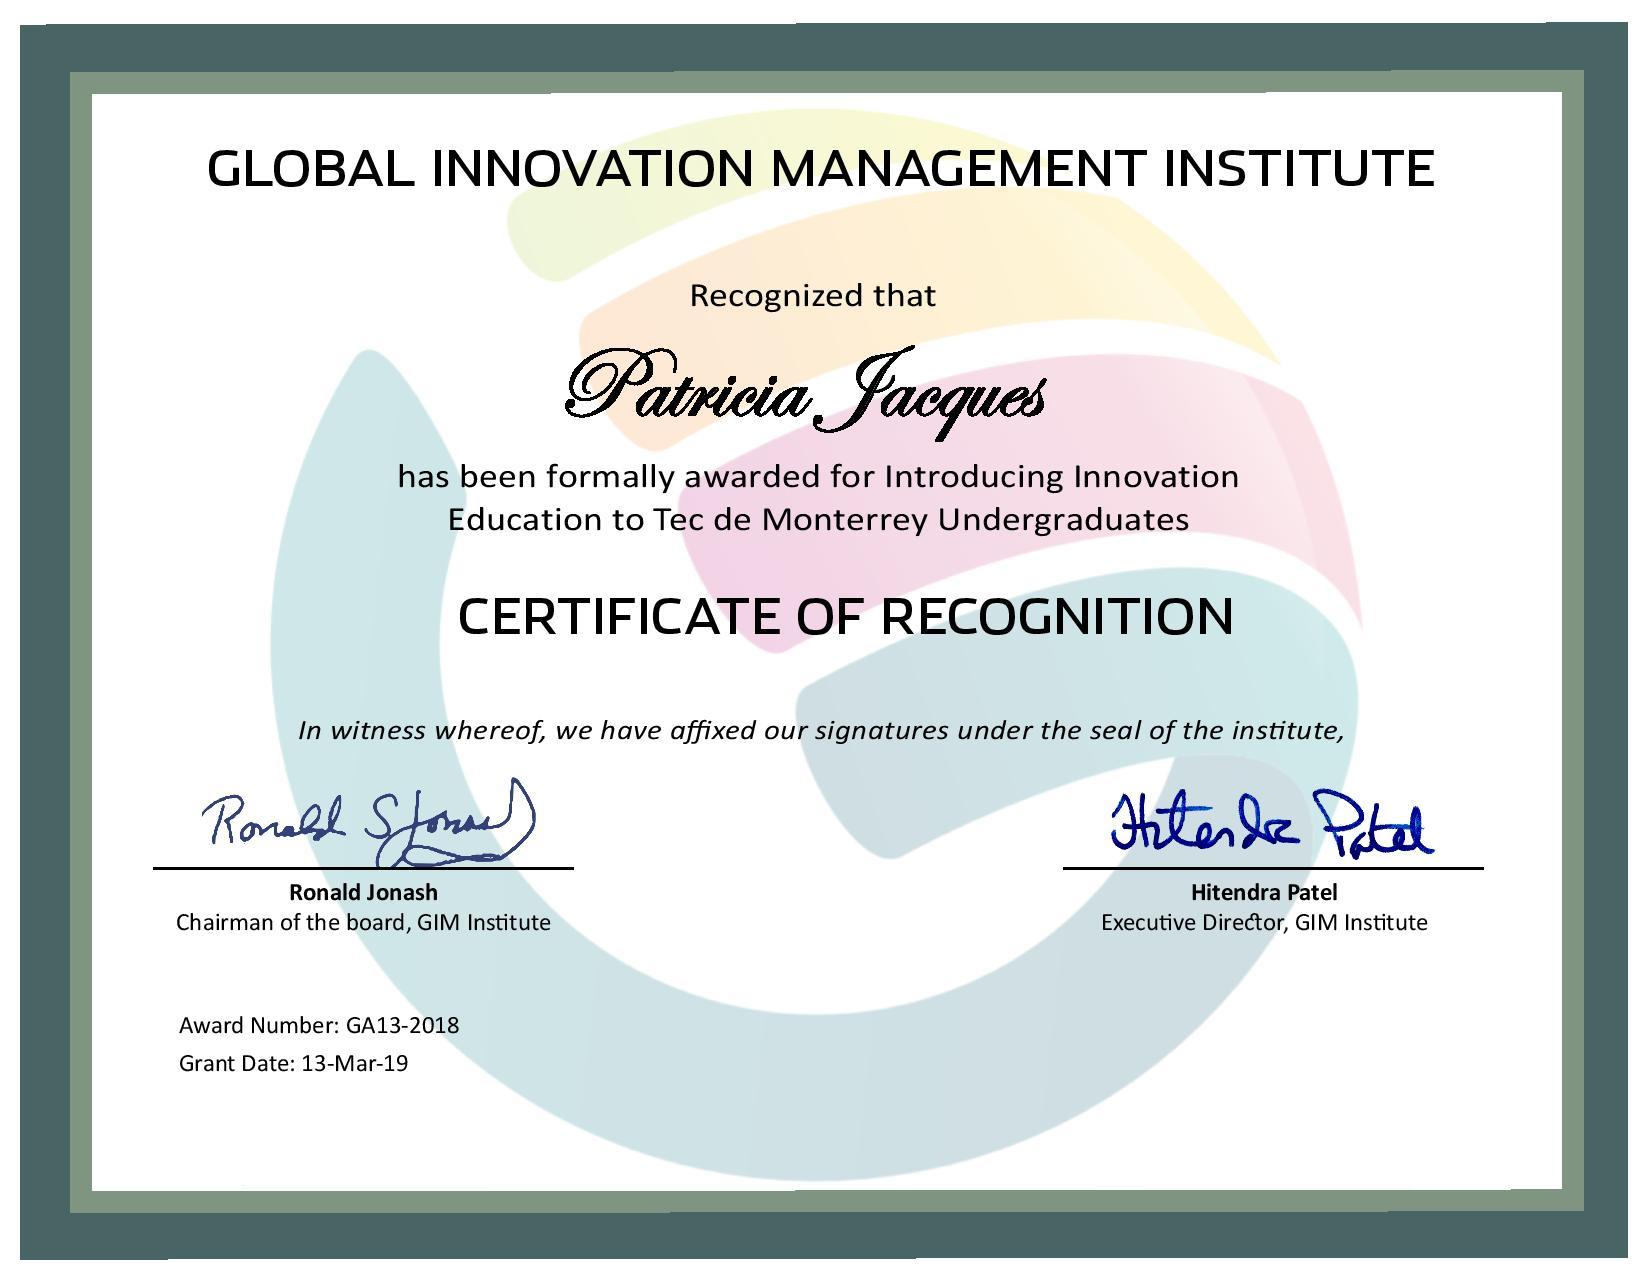 for Introducing Innovation Education to Tec de Monterrey Undergraduates